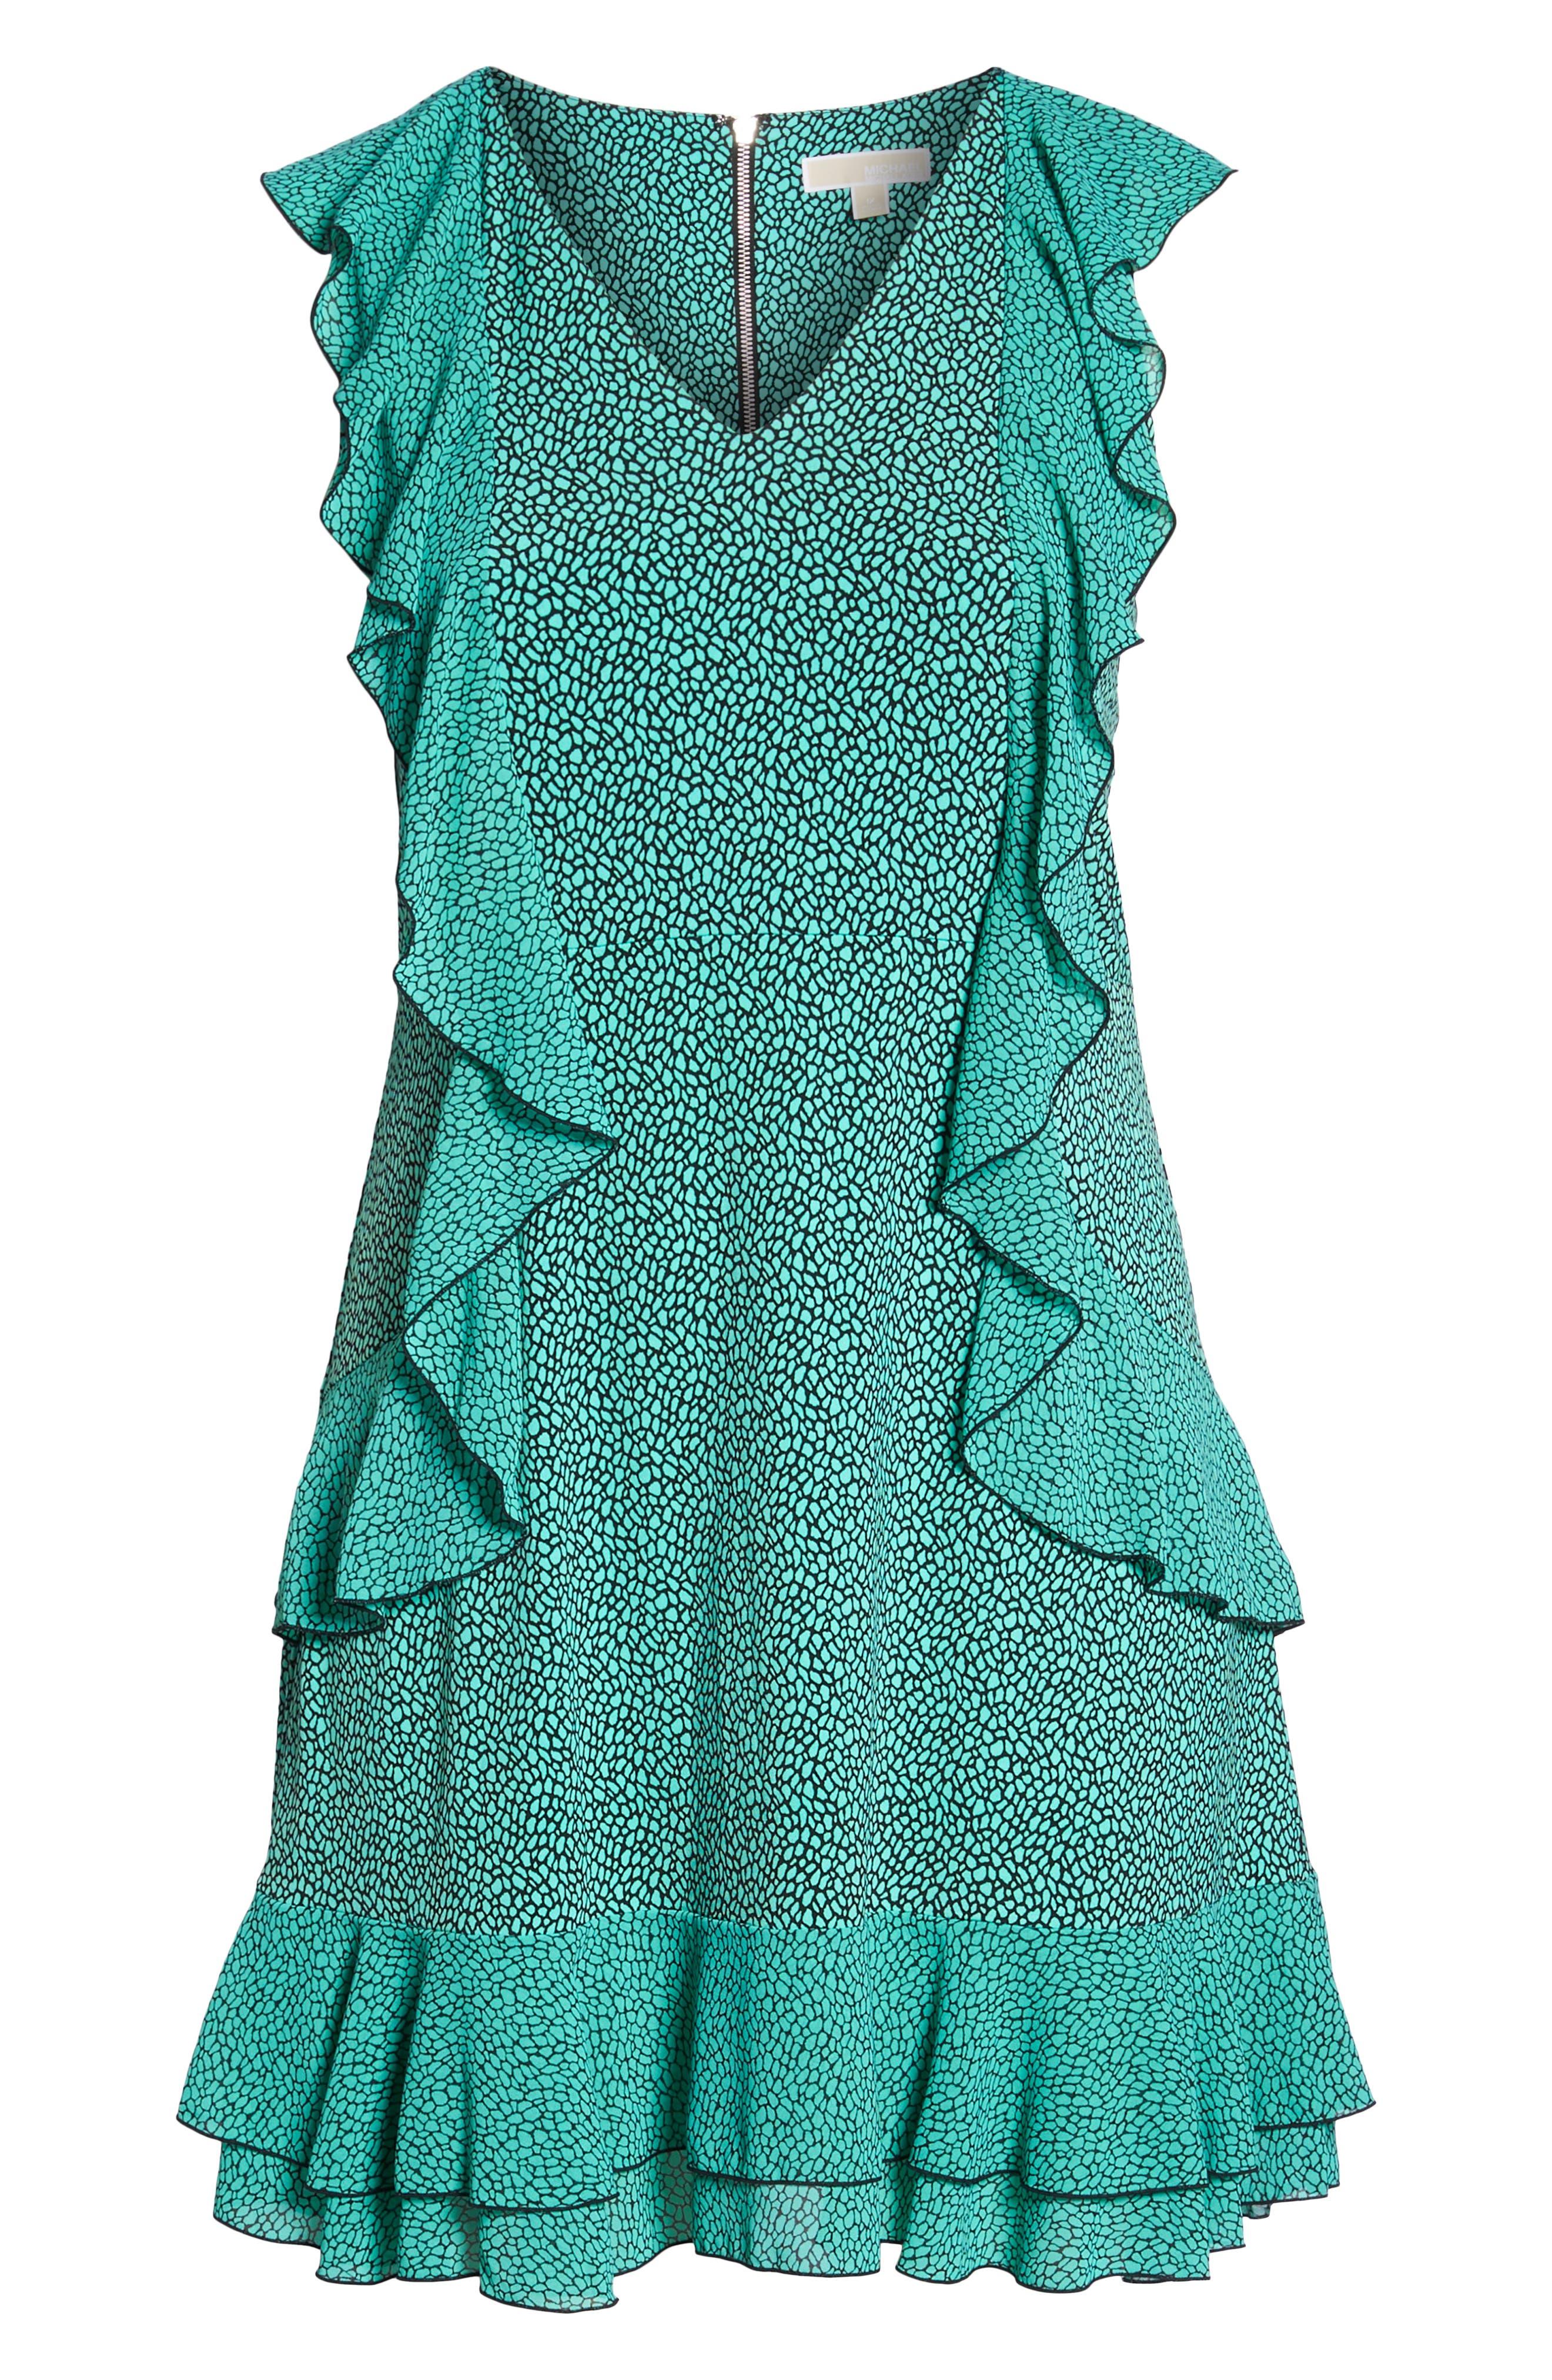 Cascade Ruffle Dress,                             Alternate thumbnail 7, color,                             AQUA/ BLACK